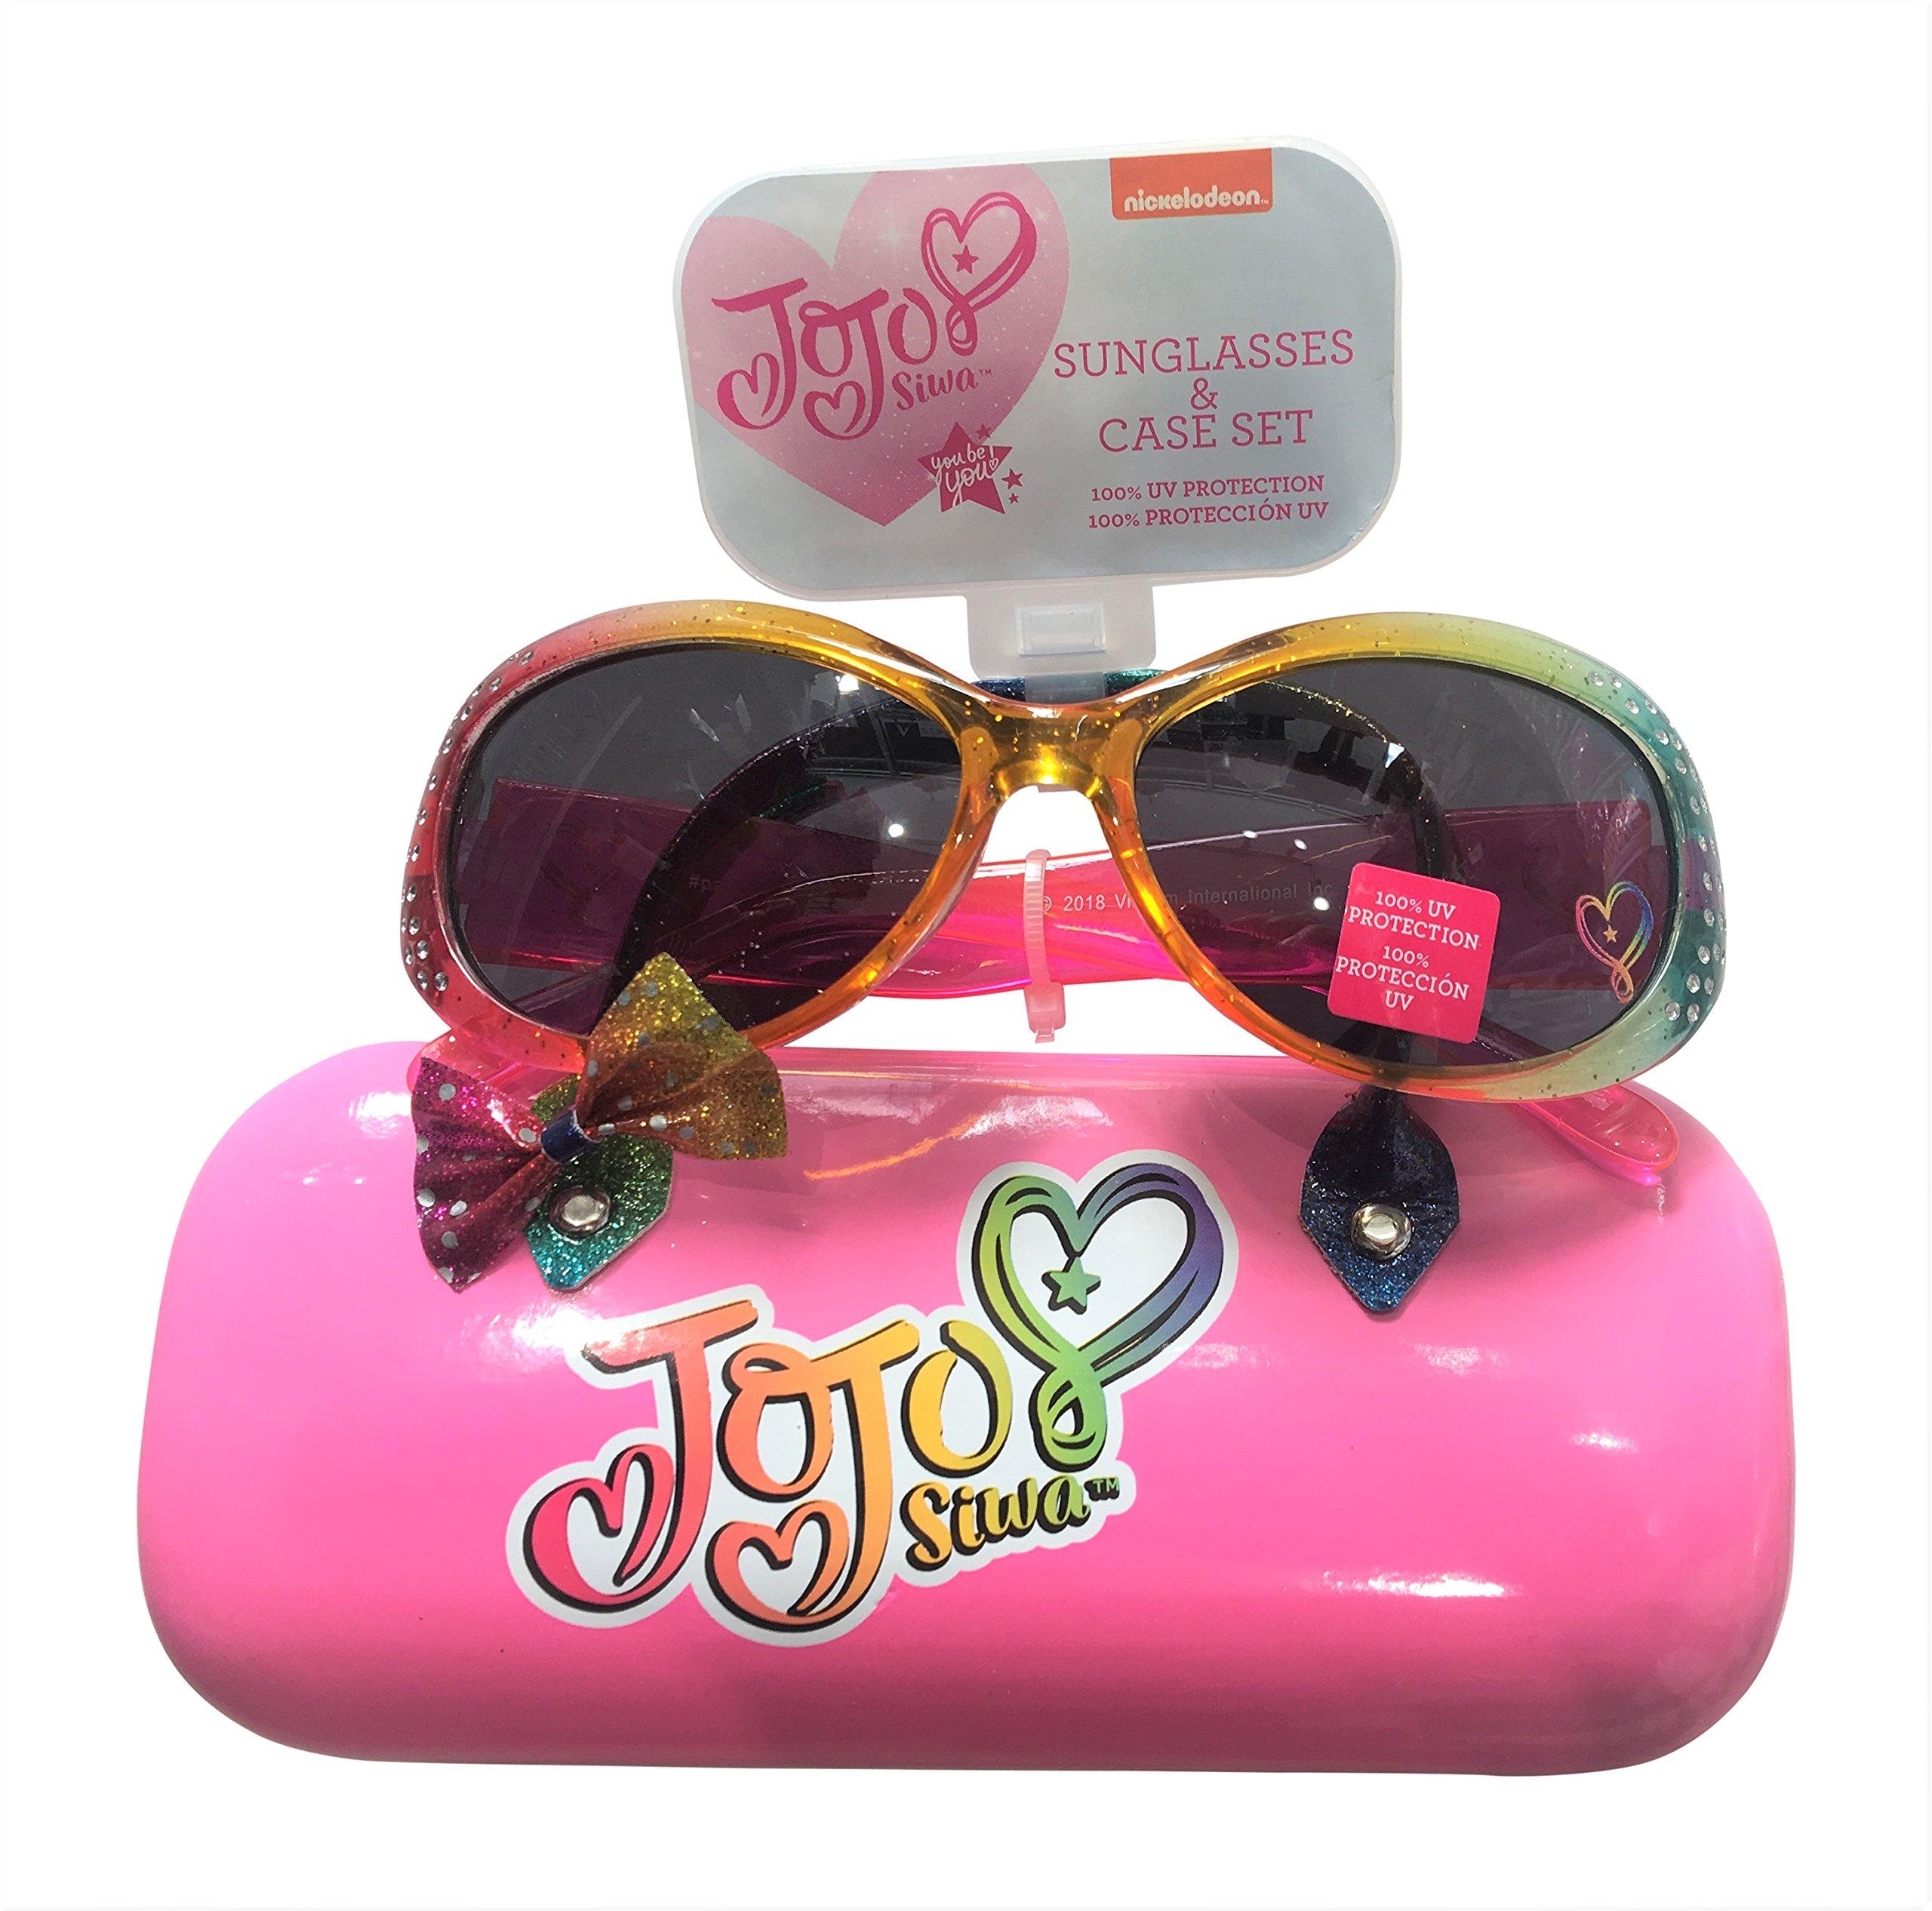 JoJo Siwa Bow Sunglasses &Hard shell Carrying Case Set - 100% UVA & UVB Protection Girls 4 - 16